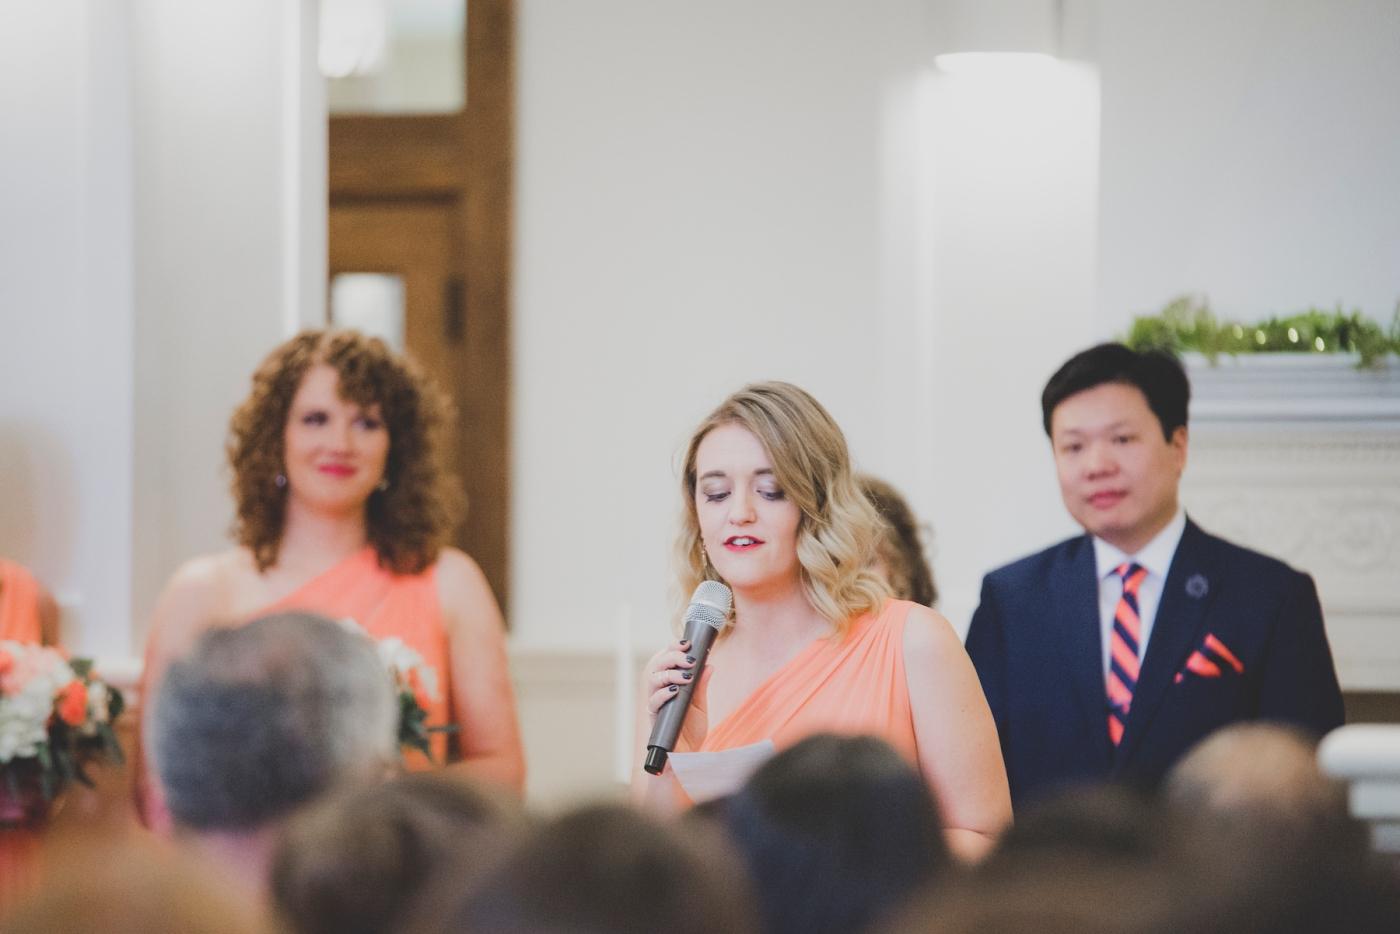 DSC_2703Everett_Wedding_Ballroom_Jane_Speleers_photography_Rachel_and_Edmund_Ceremony_2017